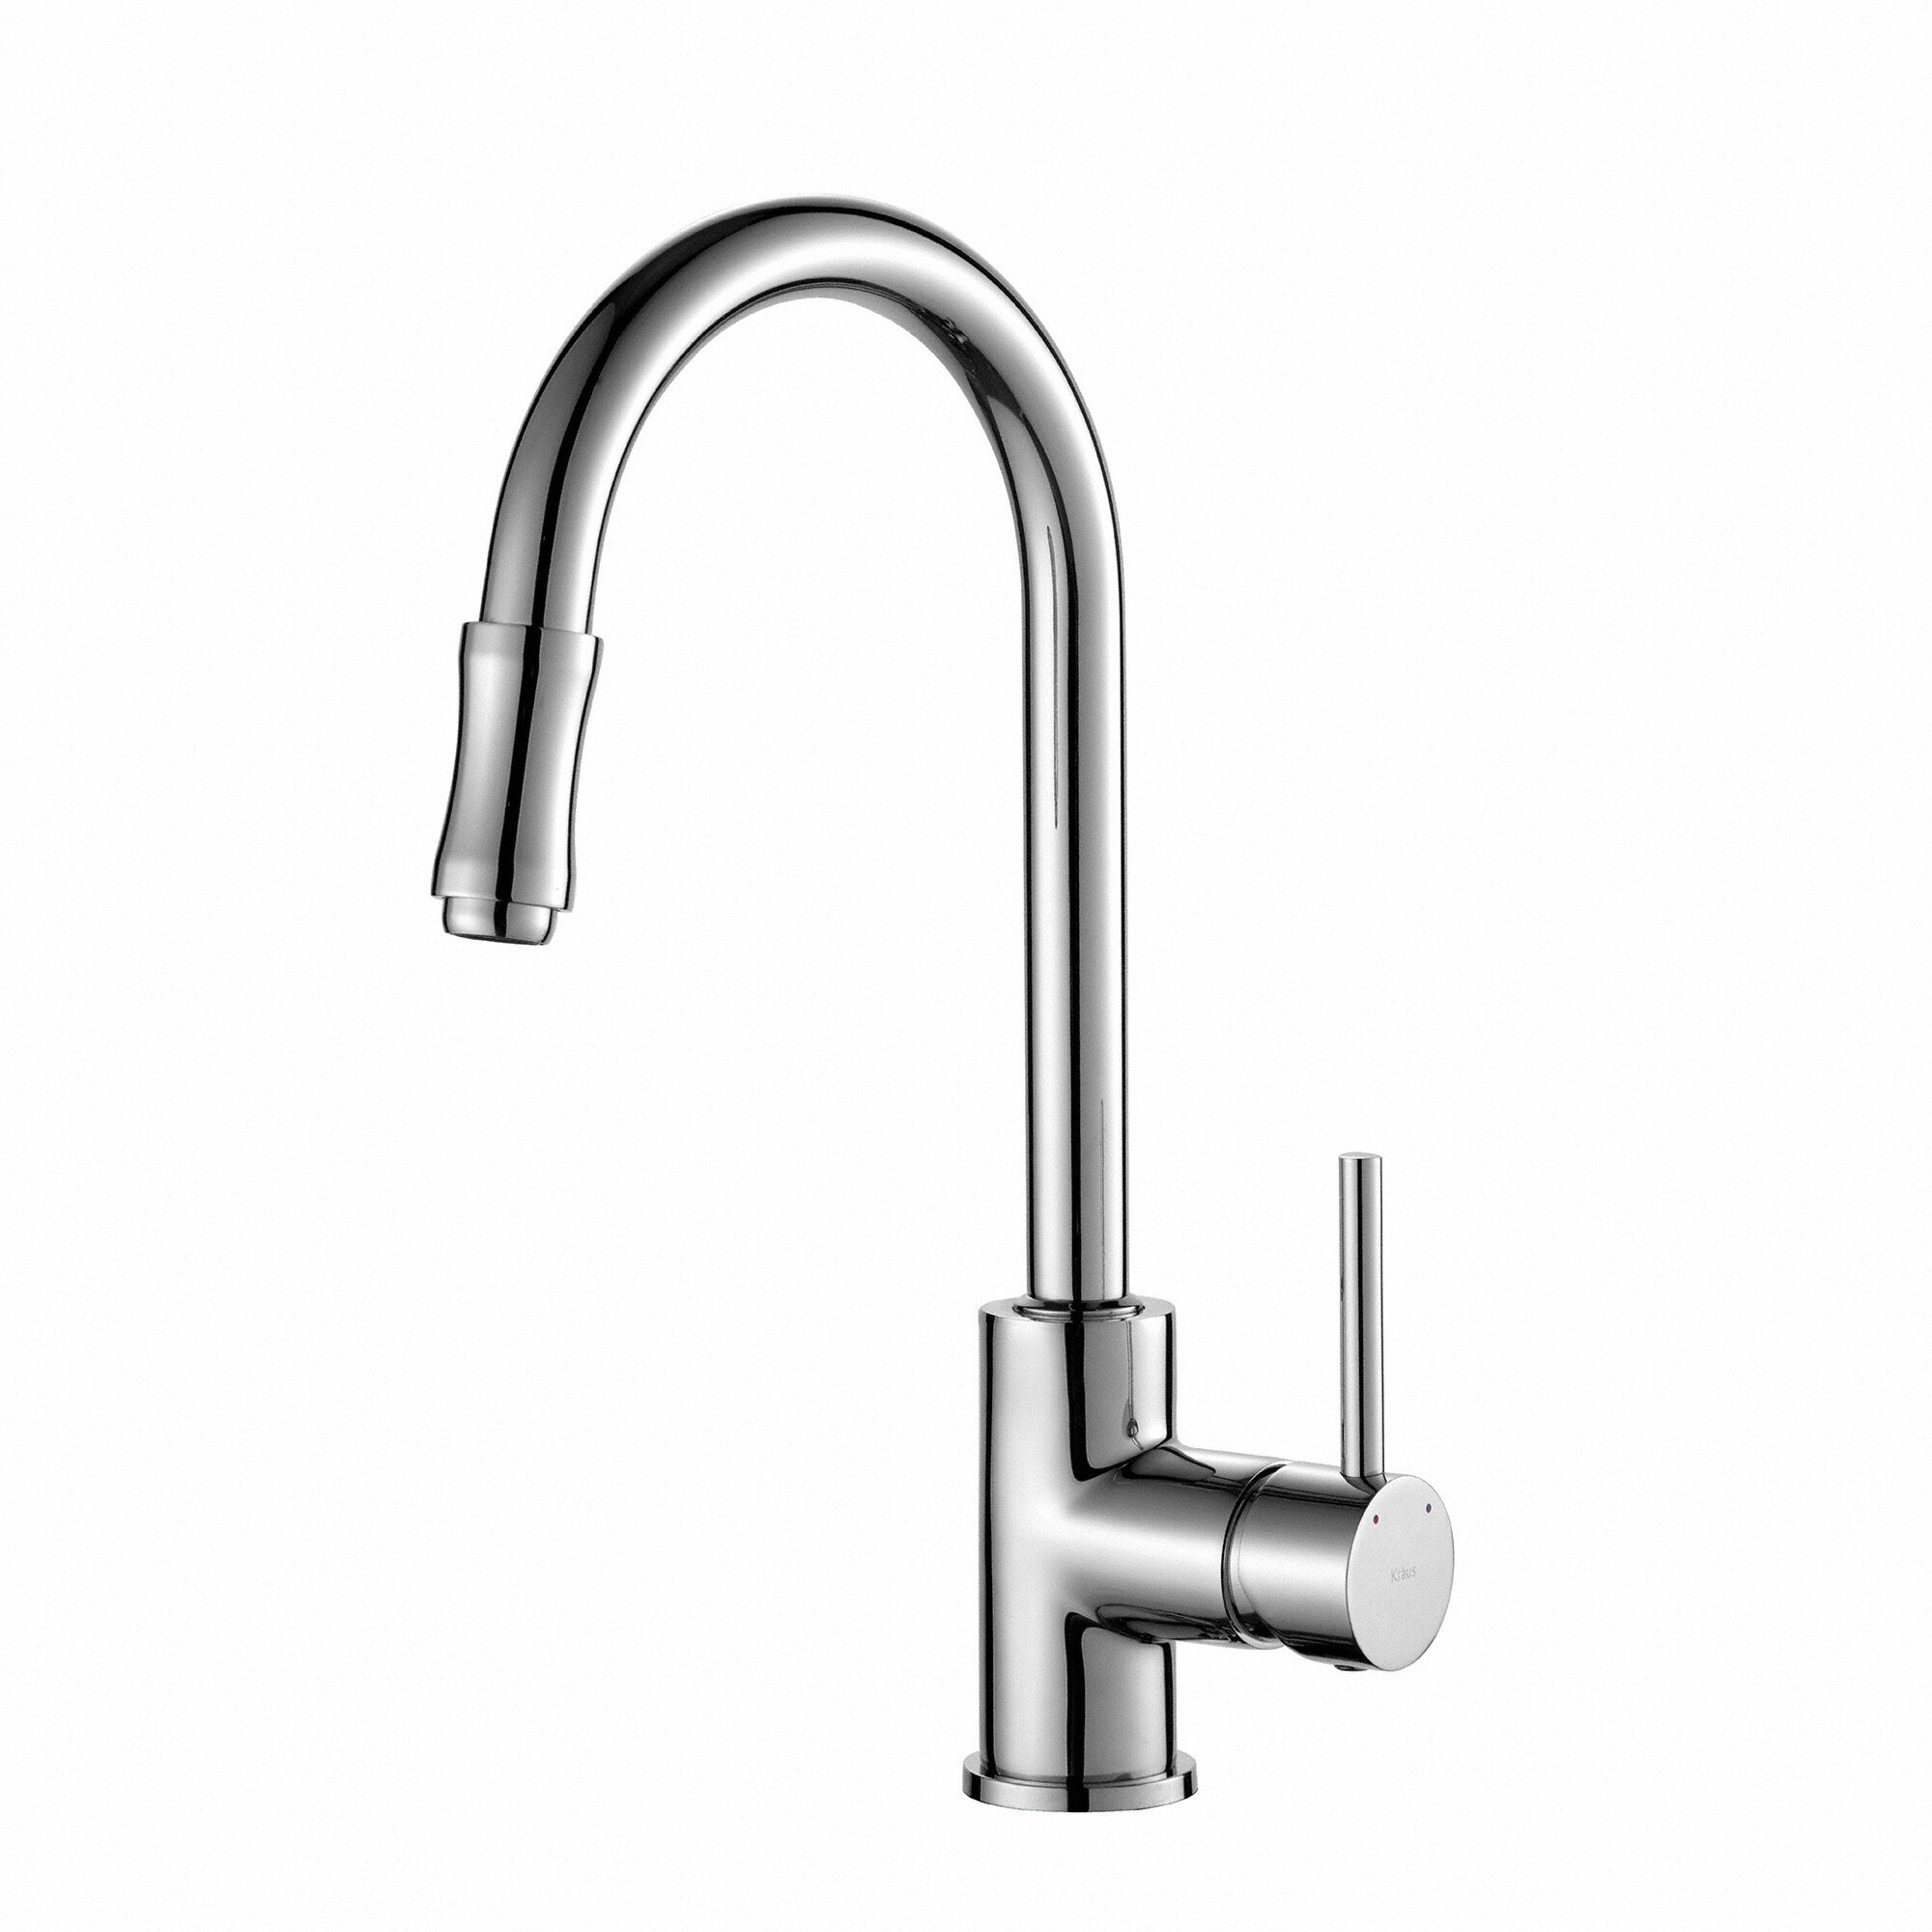 Kraus Premium Faucets Pull Down Single Handle Kitchen Faucet